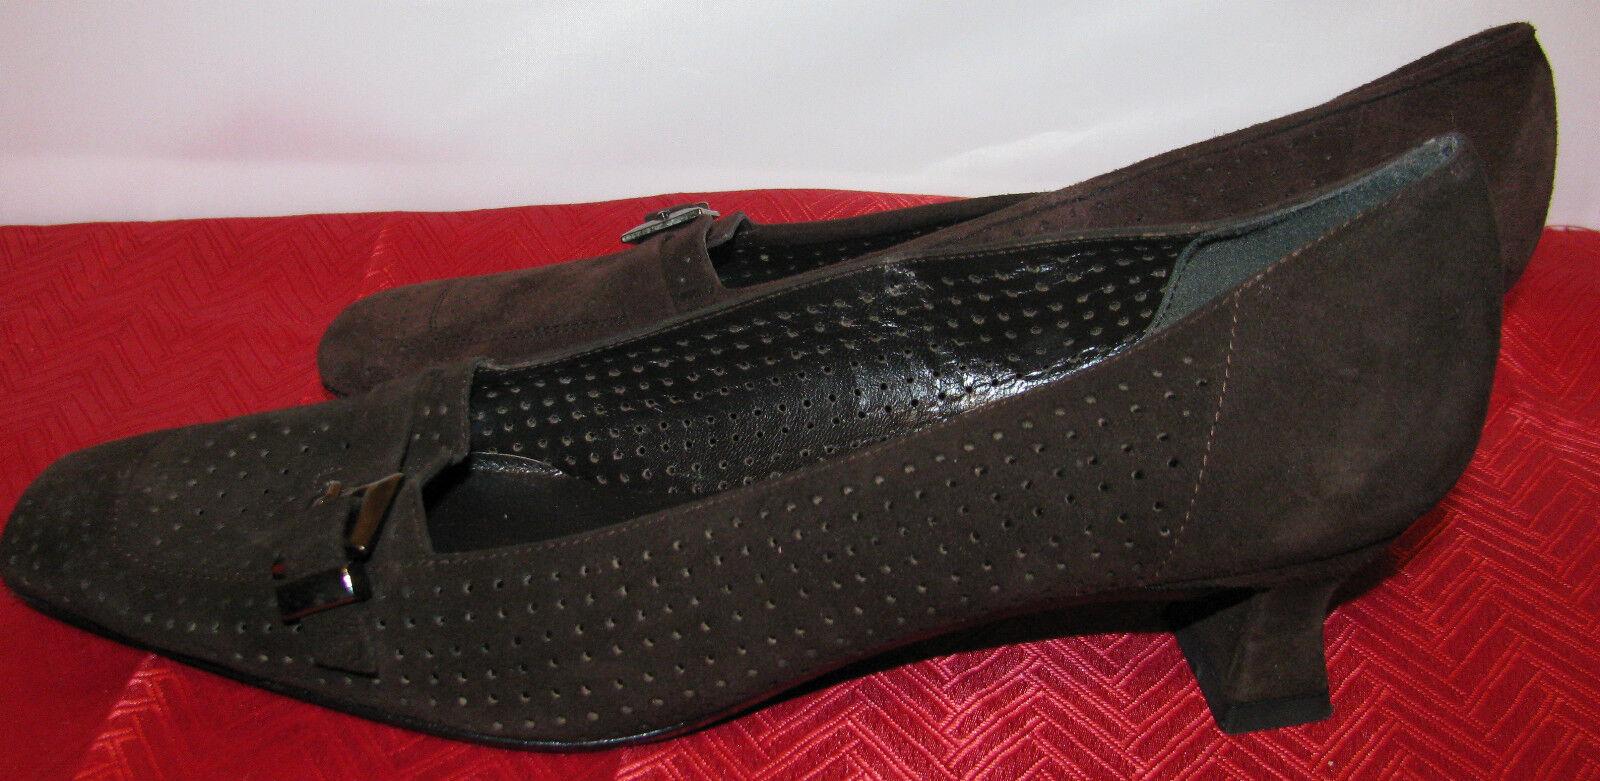 Adorable Stuart Weitzman Gamuza Marrón Cuero Zapatos Zapatos Zapatos Talla 7.5M - Usado En Excelente Estado  colores increíbles